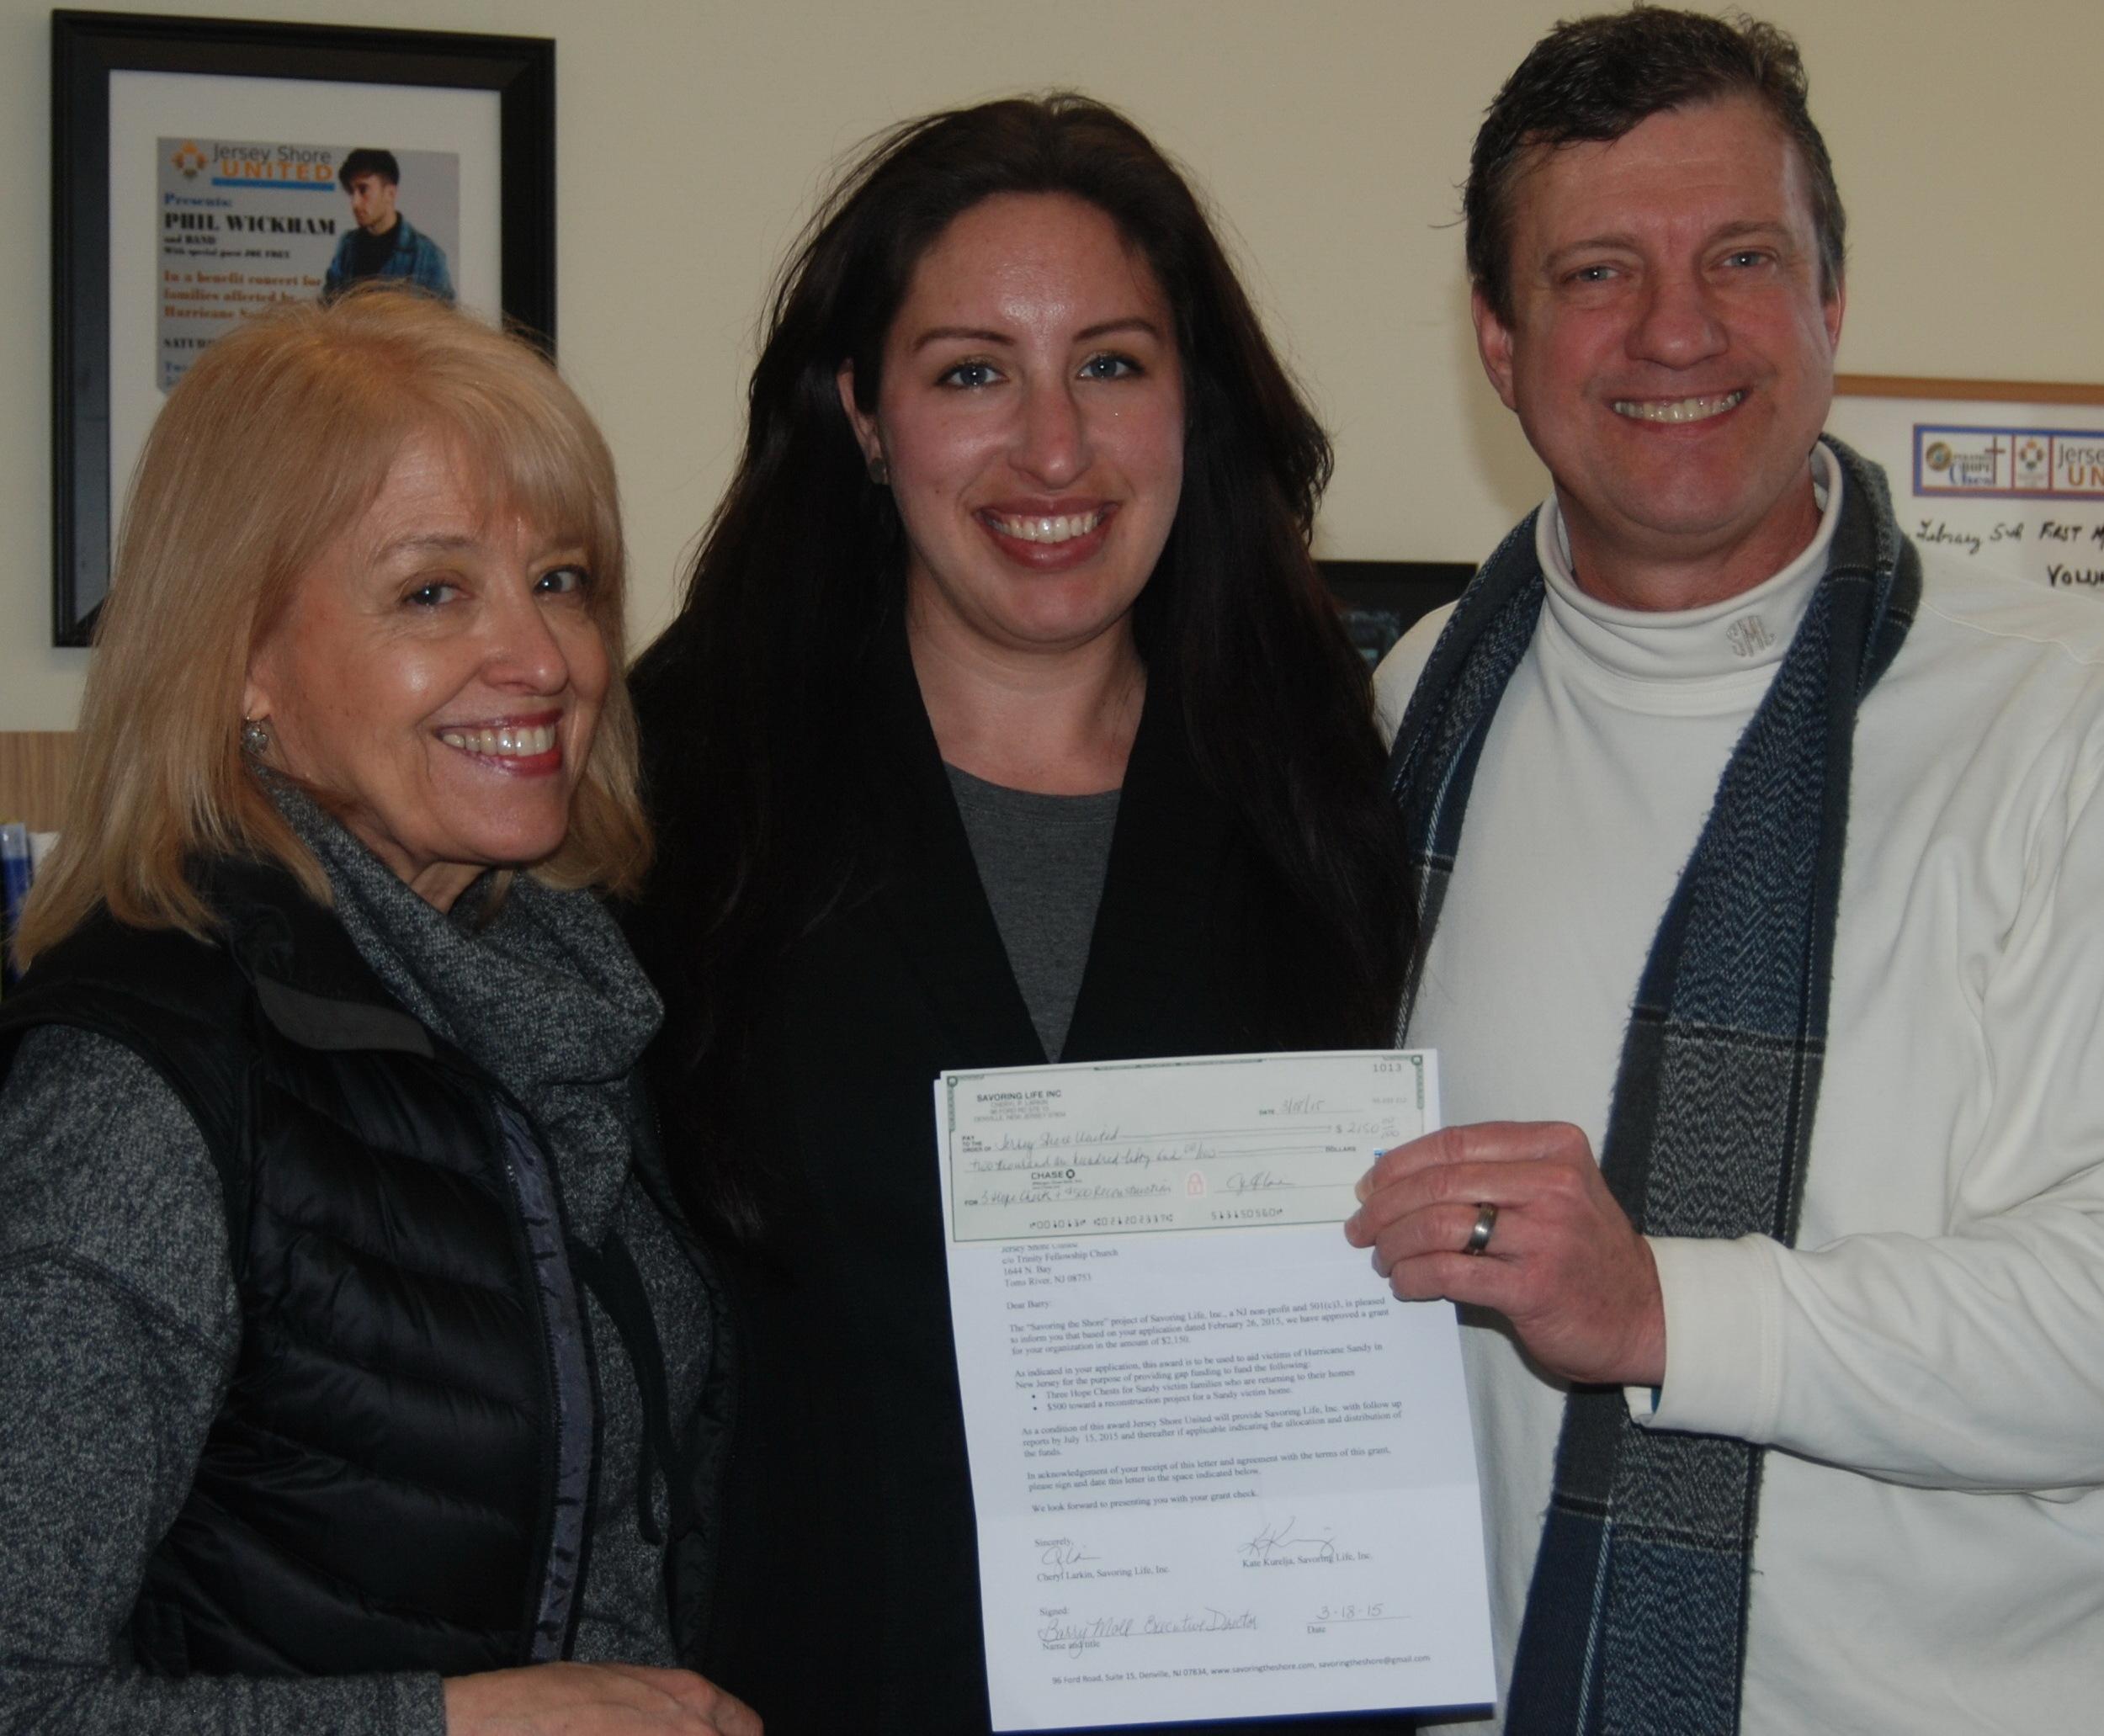 Cheryl Larkin (left) and Kate Kurelja present a Savoring grant to Barry Moll of Jersey Shore United.